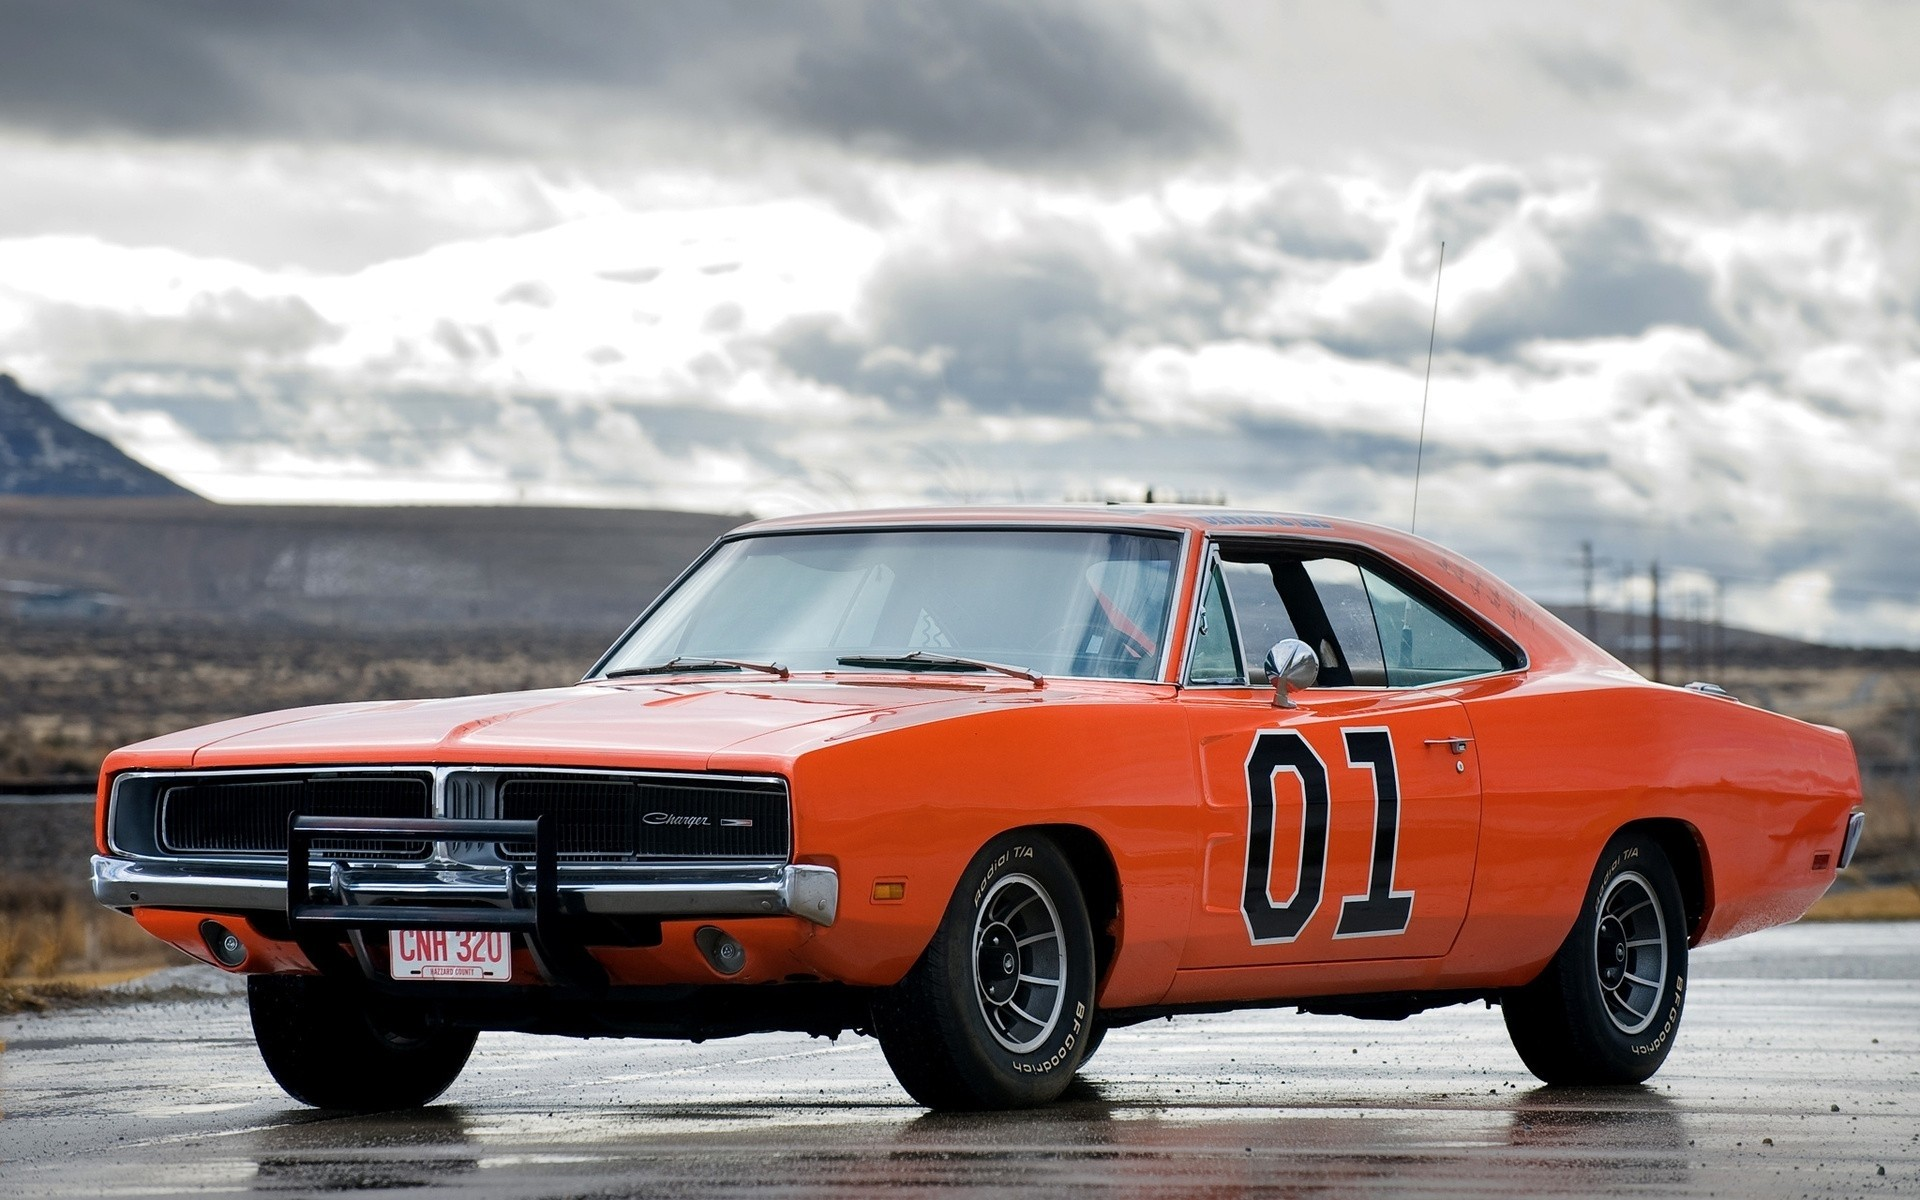 1969 Dodge Charger 500 426 Hemi